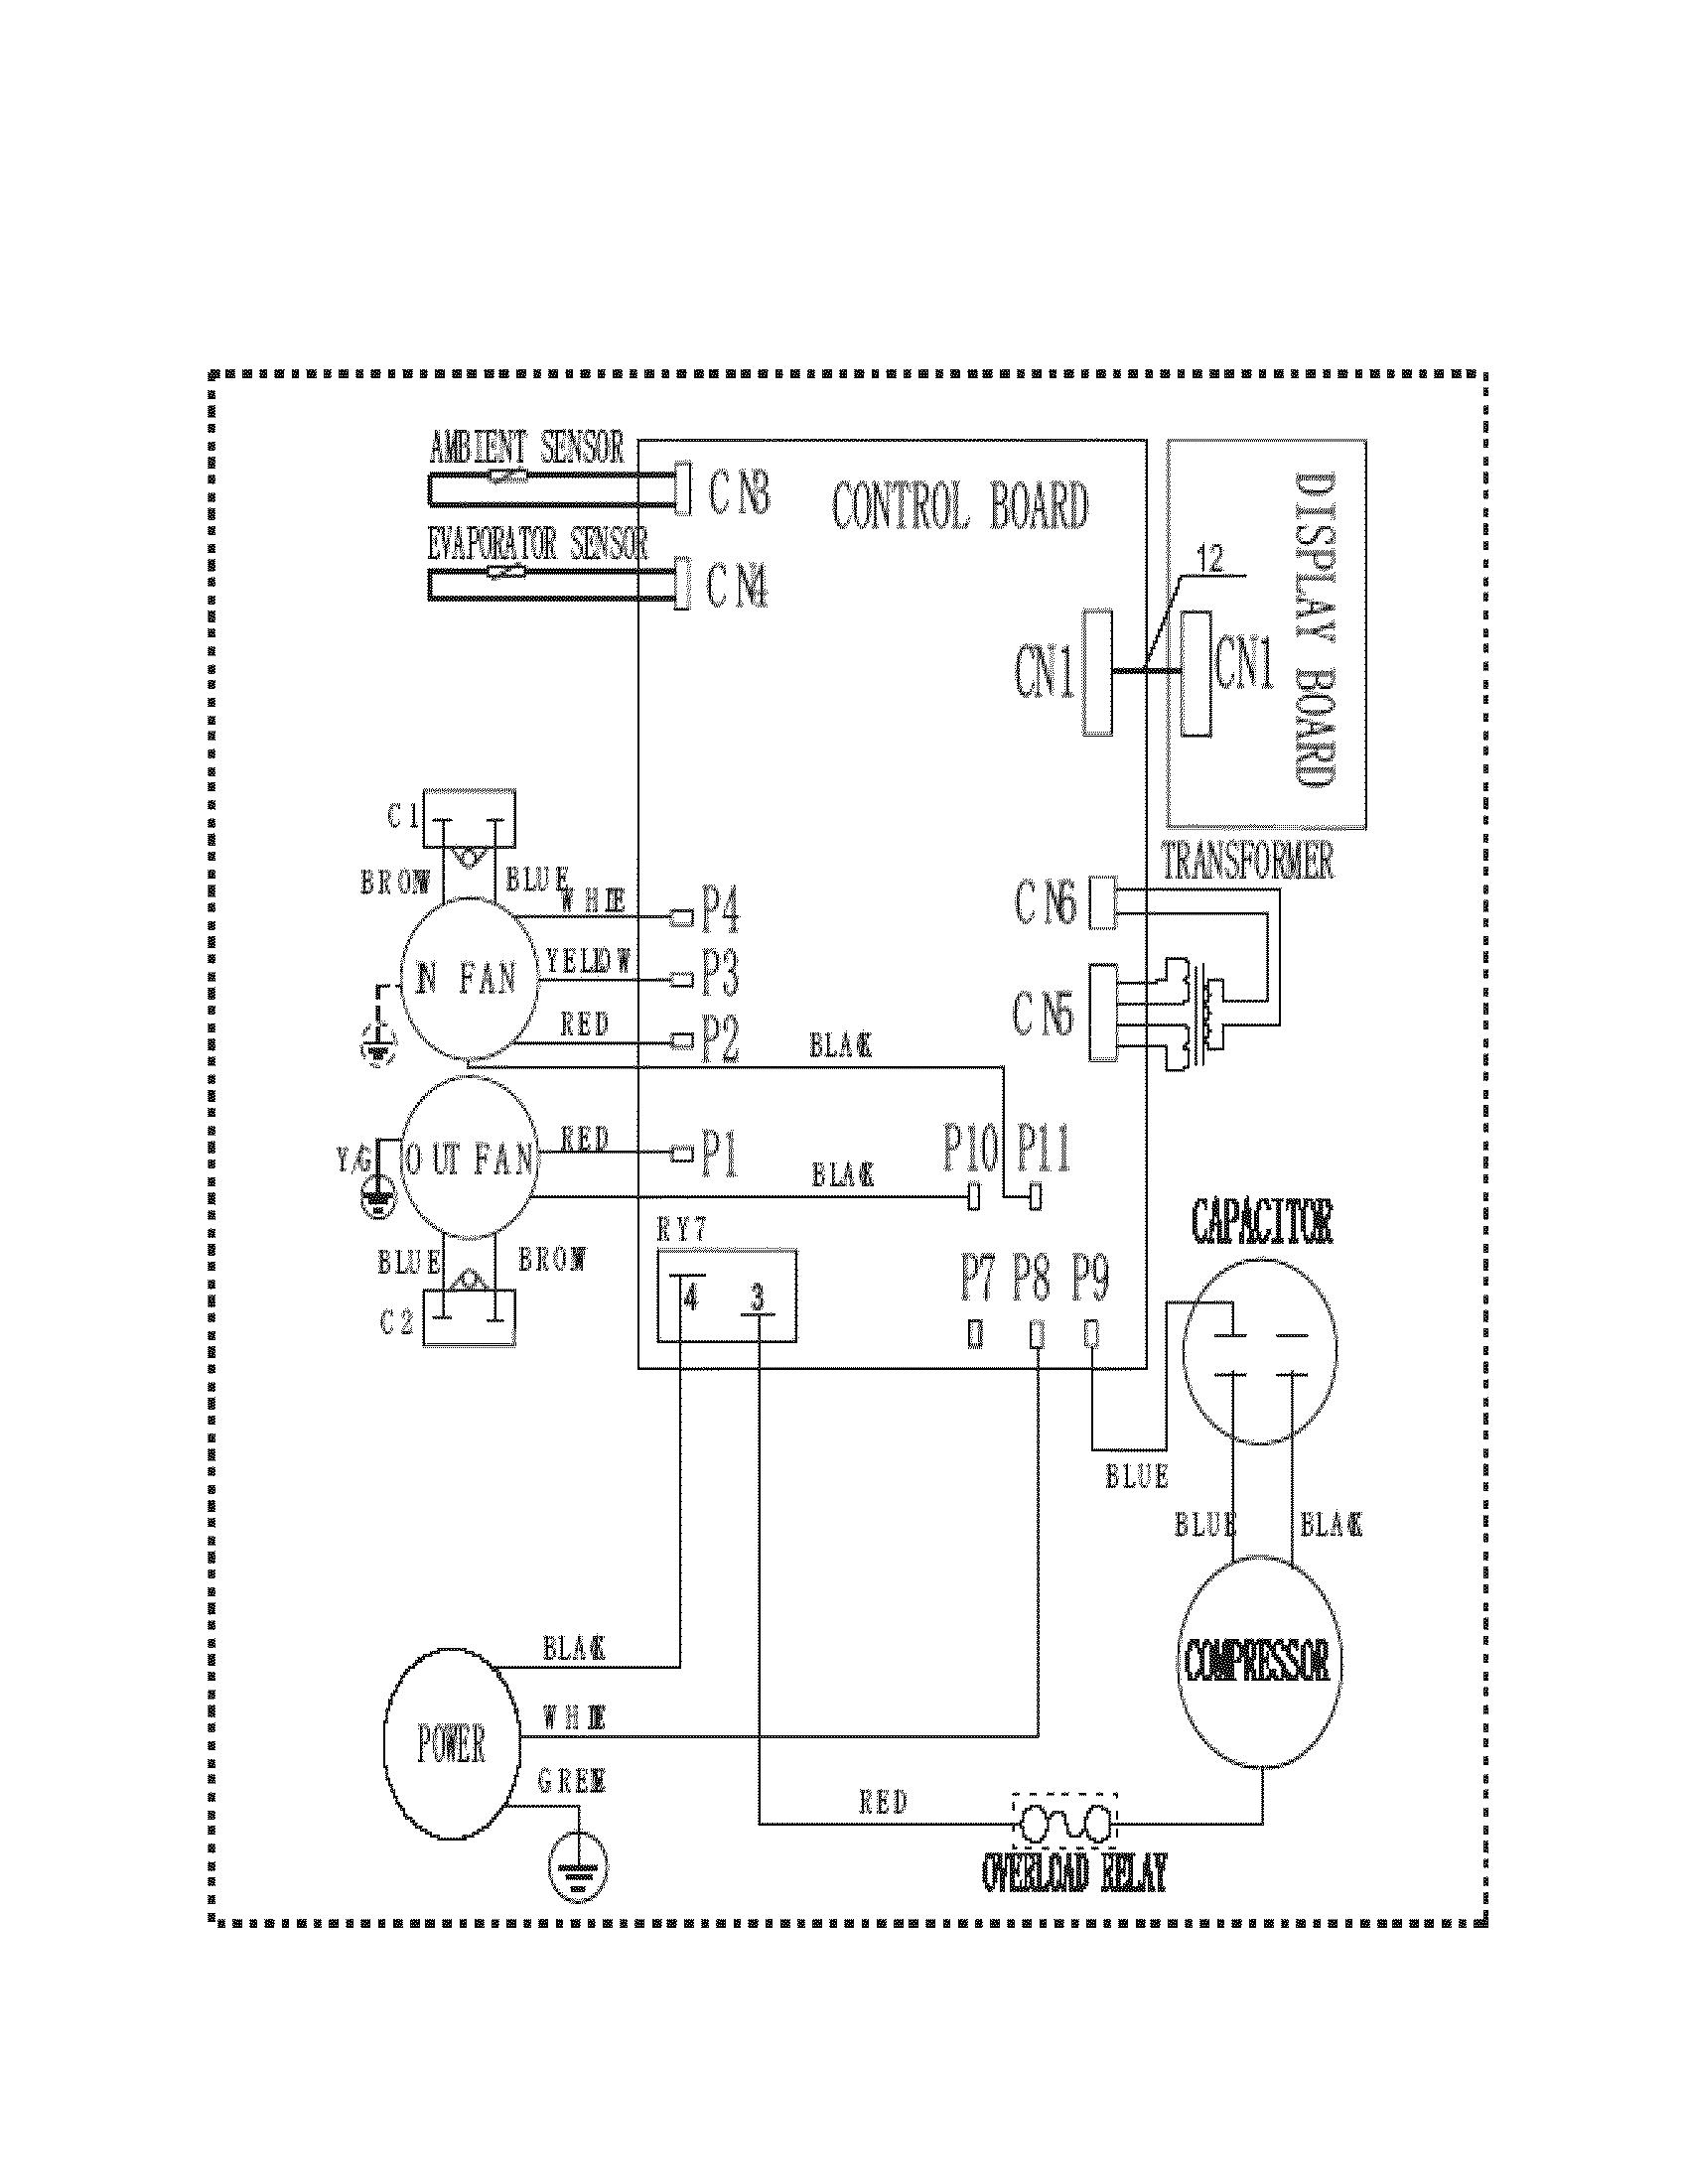 Weathertron Thermostat Wiring Diagram Trane Bay X A on